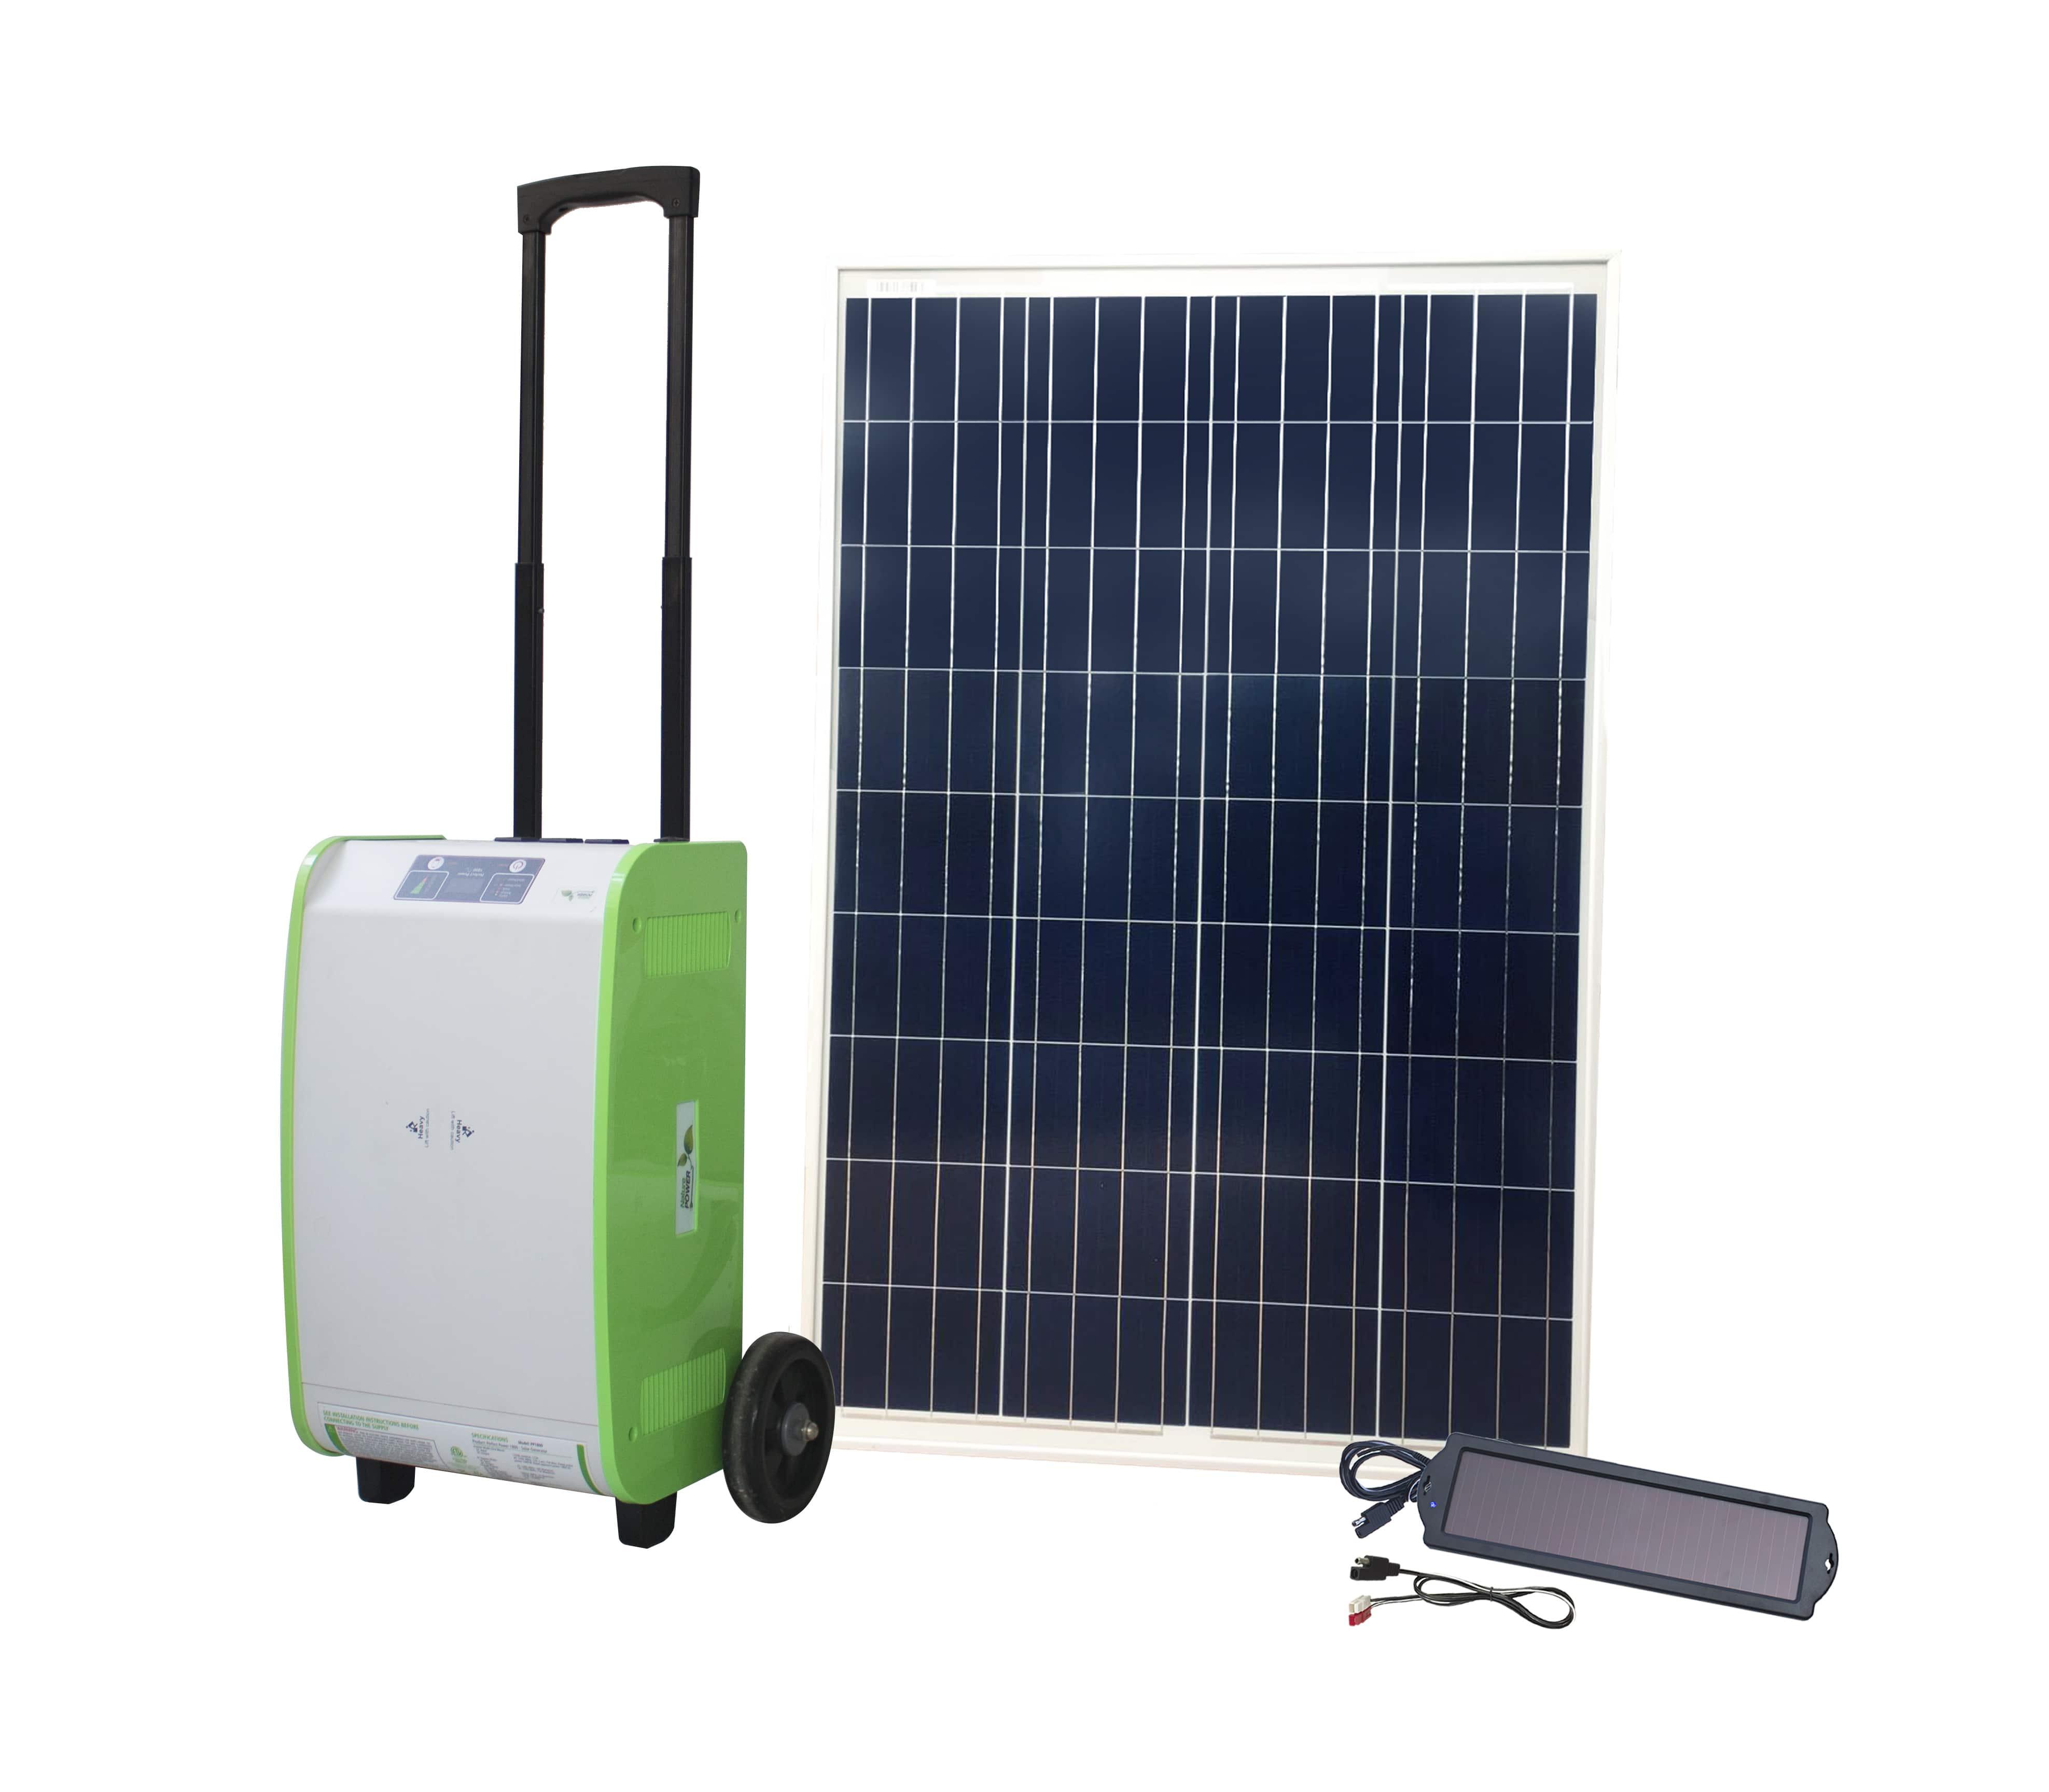 Nature PowerPak Solar Generator Kits from $800